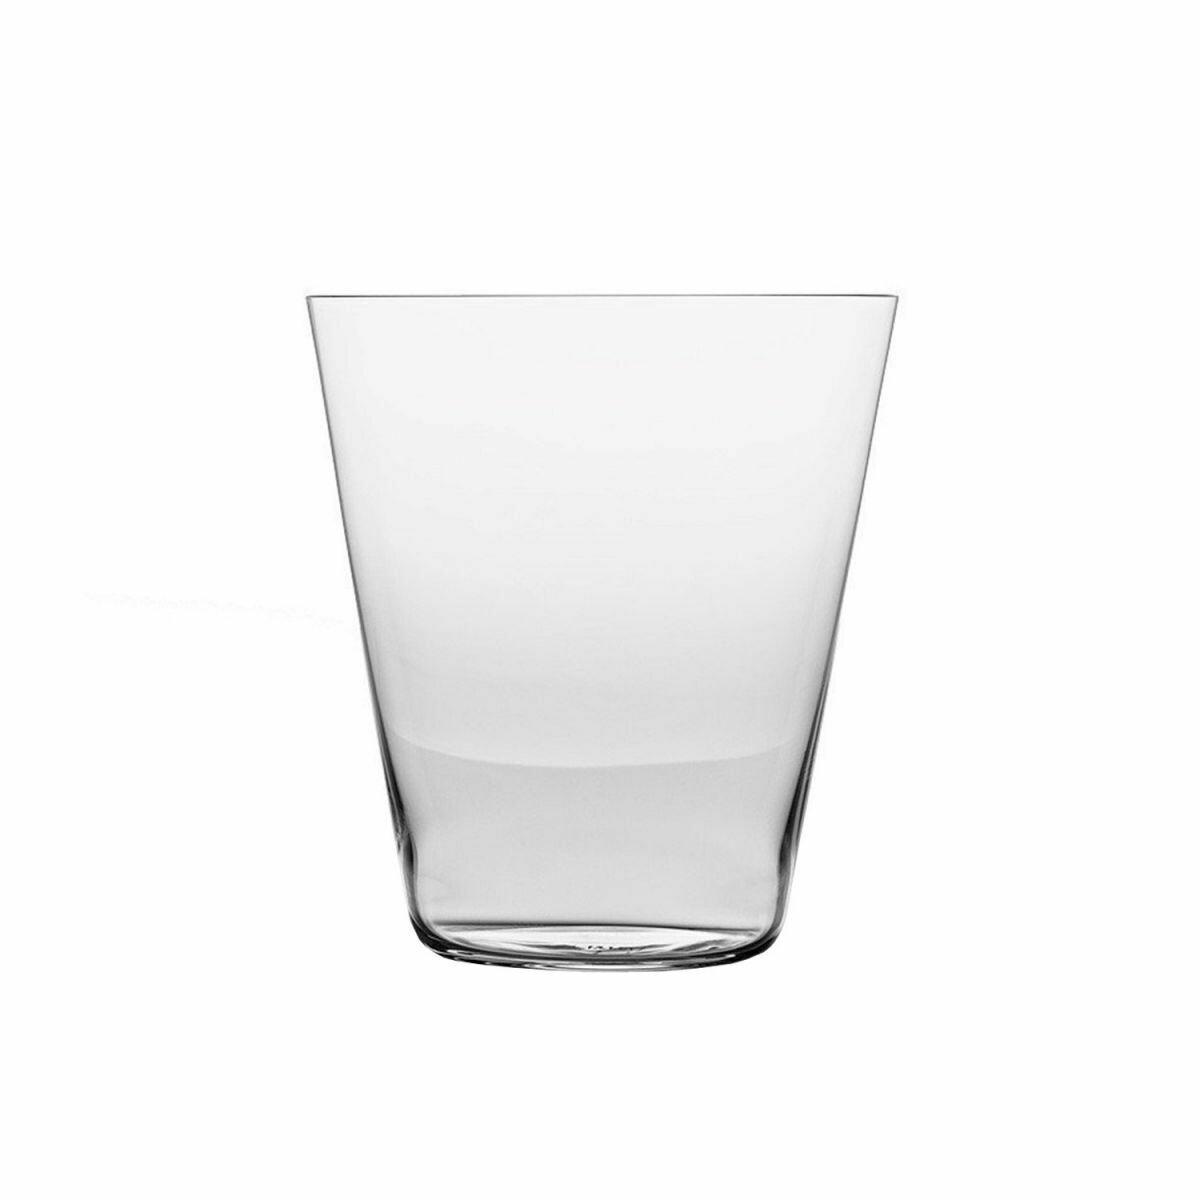 ZALTO DENK'ART Water Coupe crystal